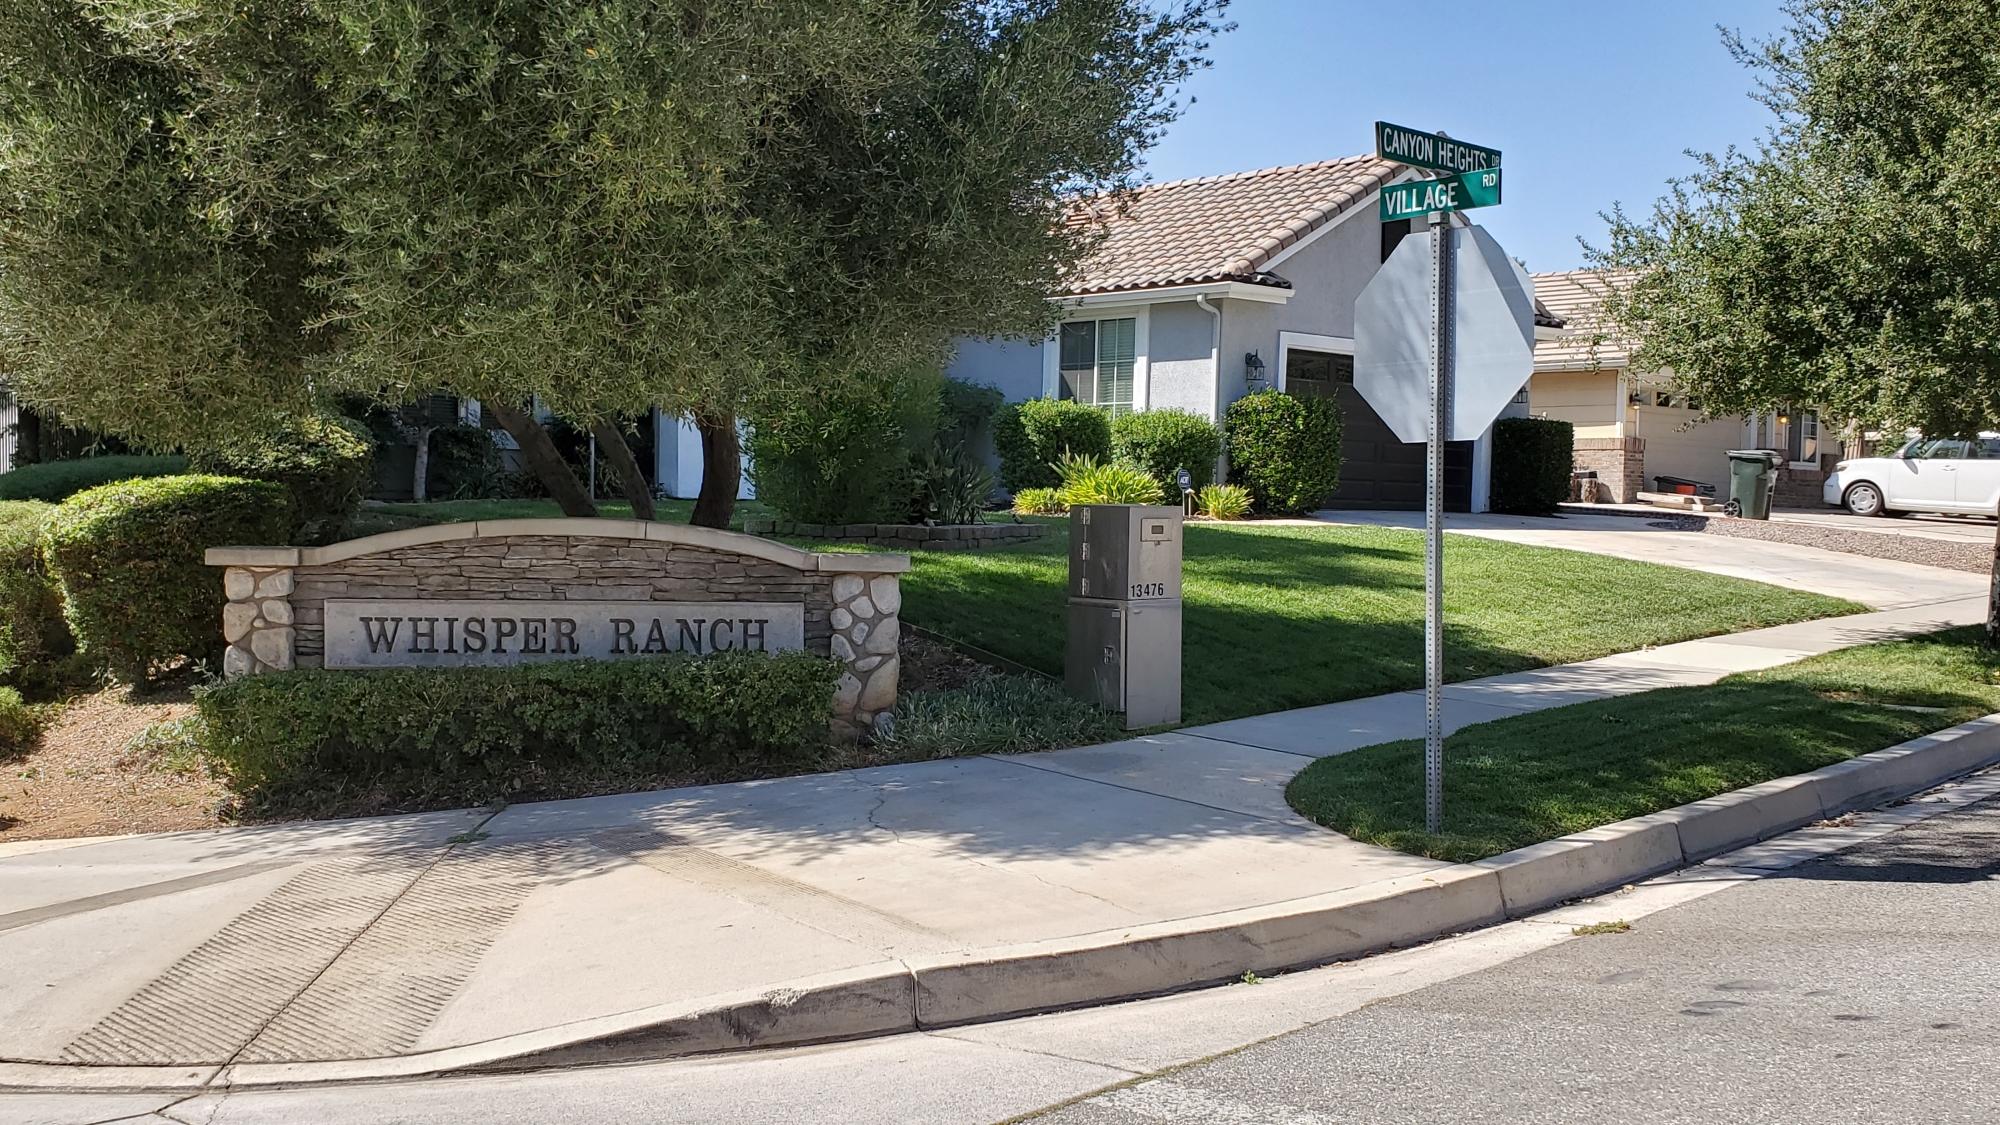 Community of Whisper Ranch